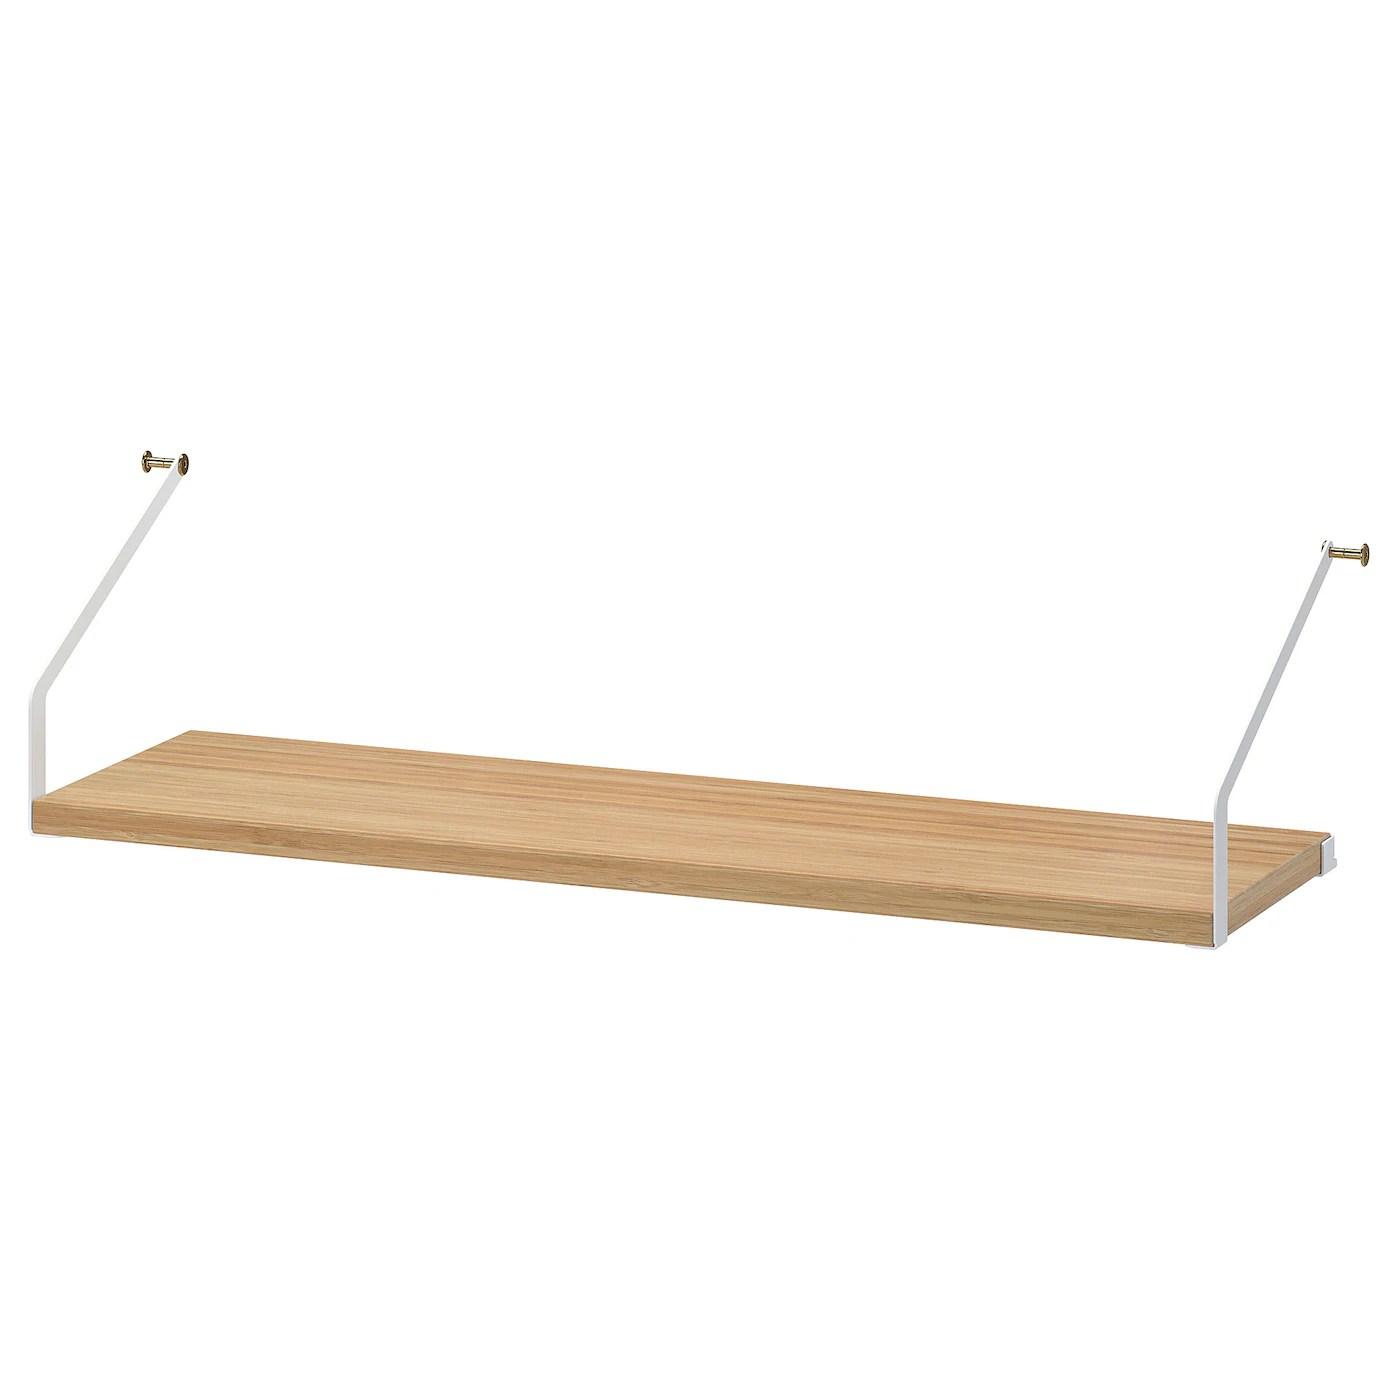 svalnas tablette bambou 81x25 cm